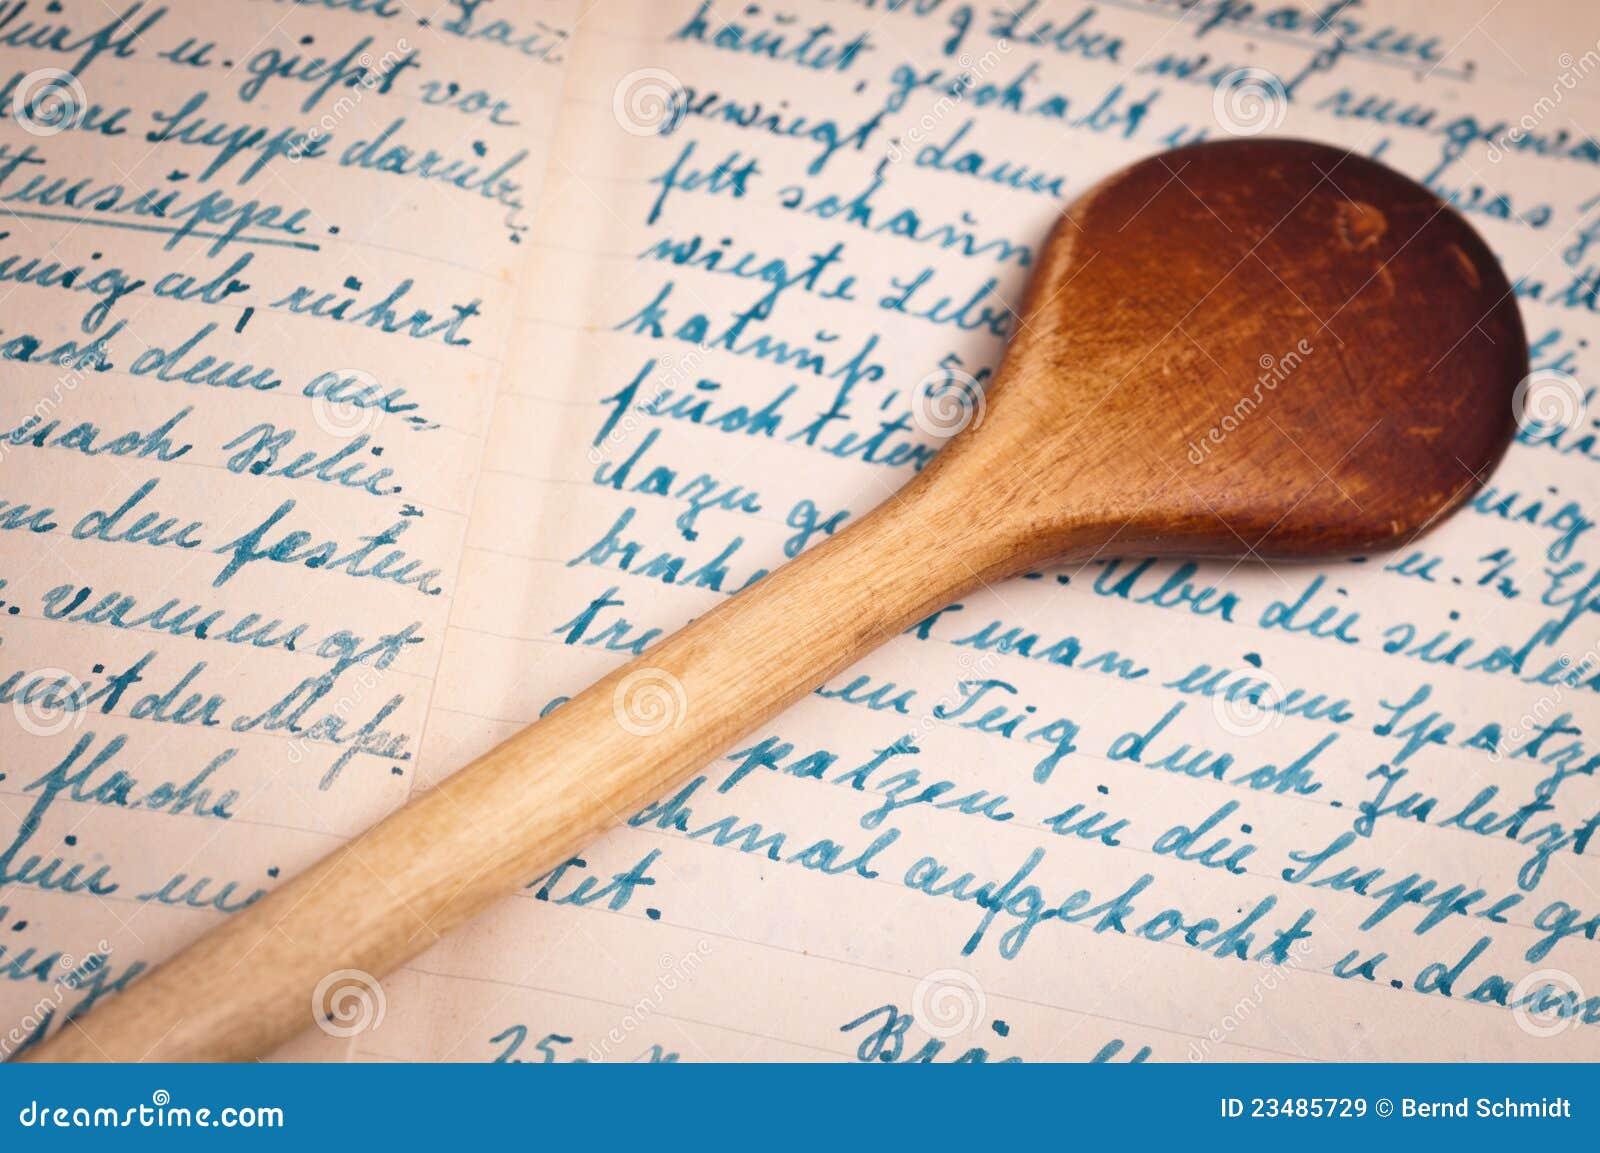 Rezept mit handschrift und kochen l ffel lizenzfreie for Kochbuch backen